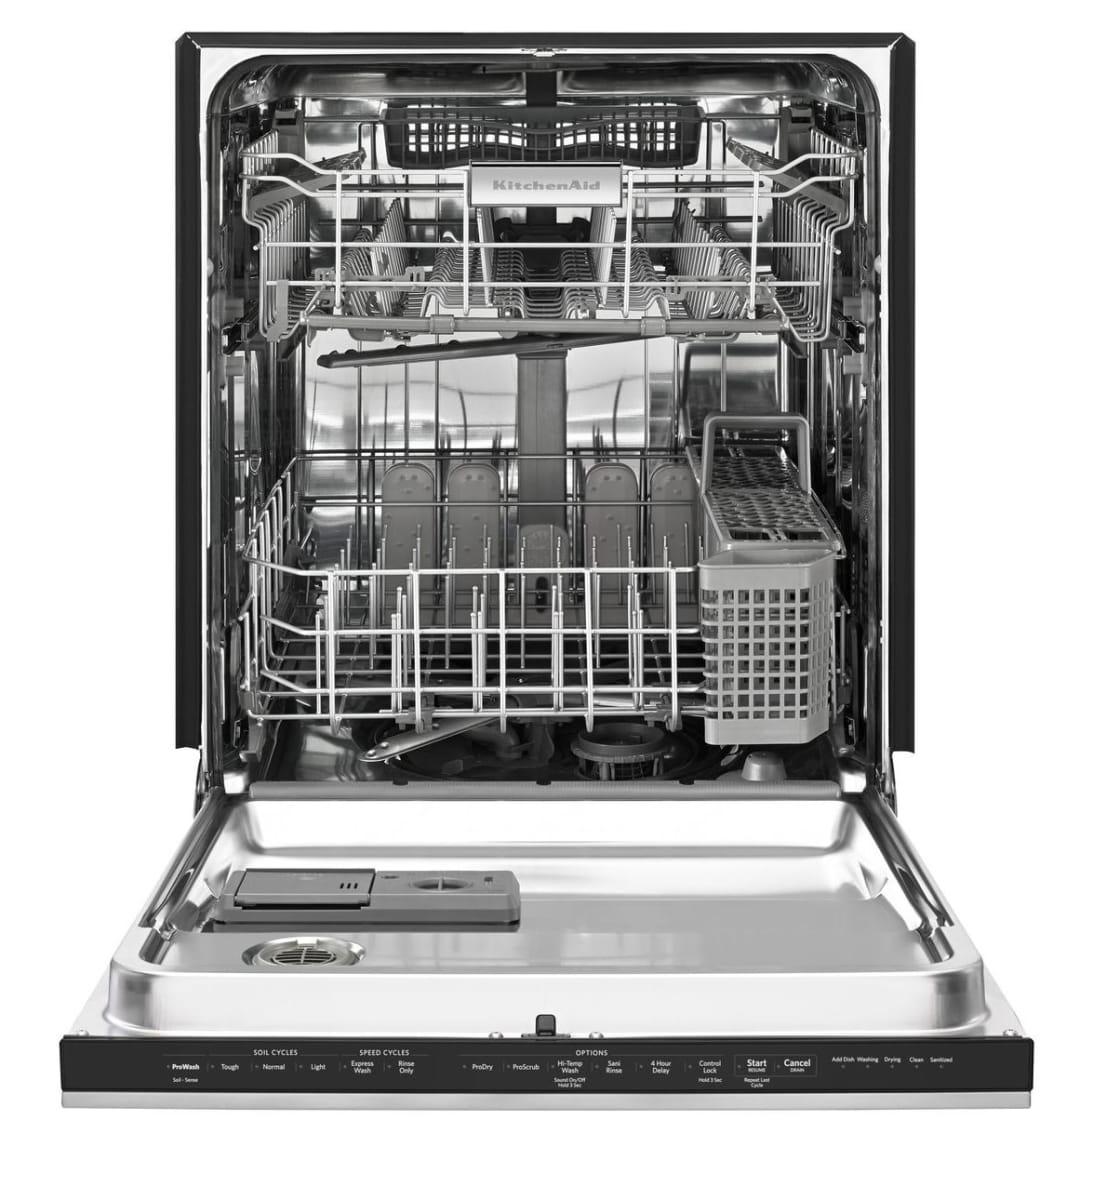 Kitchenaid Dishwasher Dishwashers Kdte404dsp,Game Of Thrones Toilet Seat